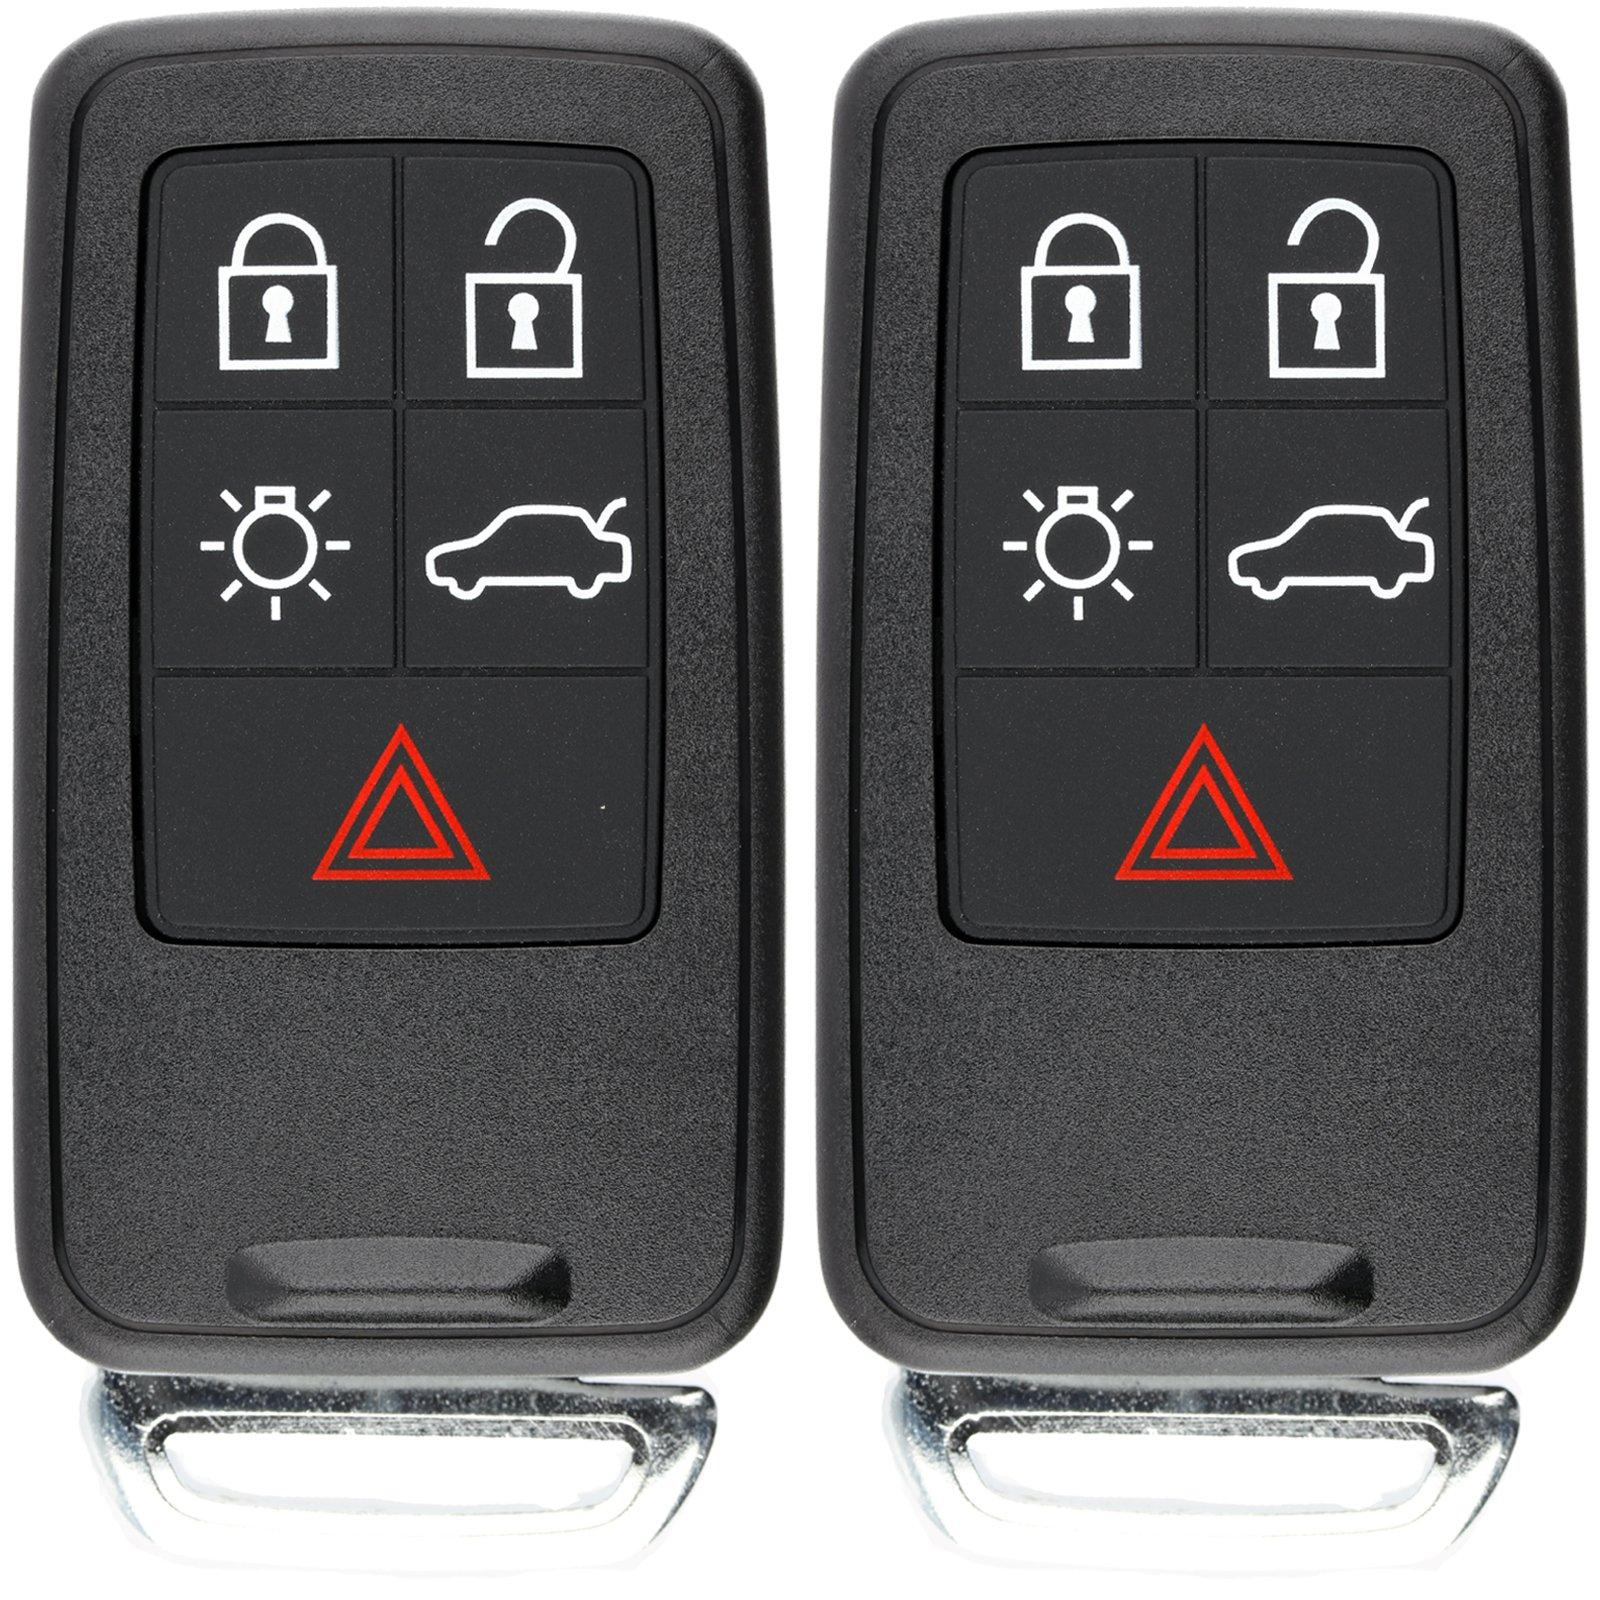 KeylessOption Keyless Entry Remote Control Smart Car Key Fob Clicker Uncut Key Blade for Volvo KR55WK49264 (Pack of 2)